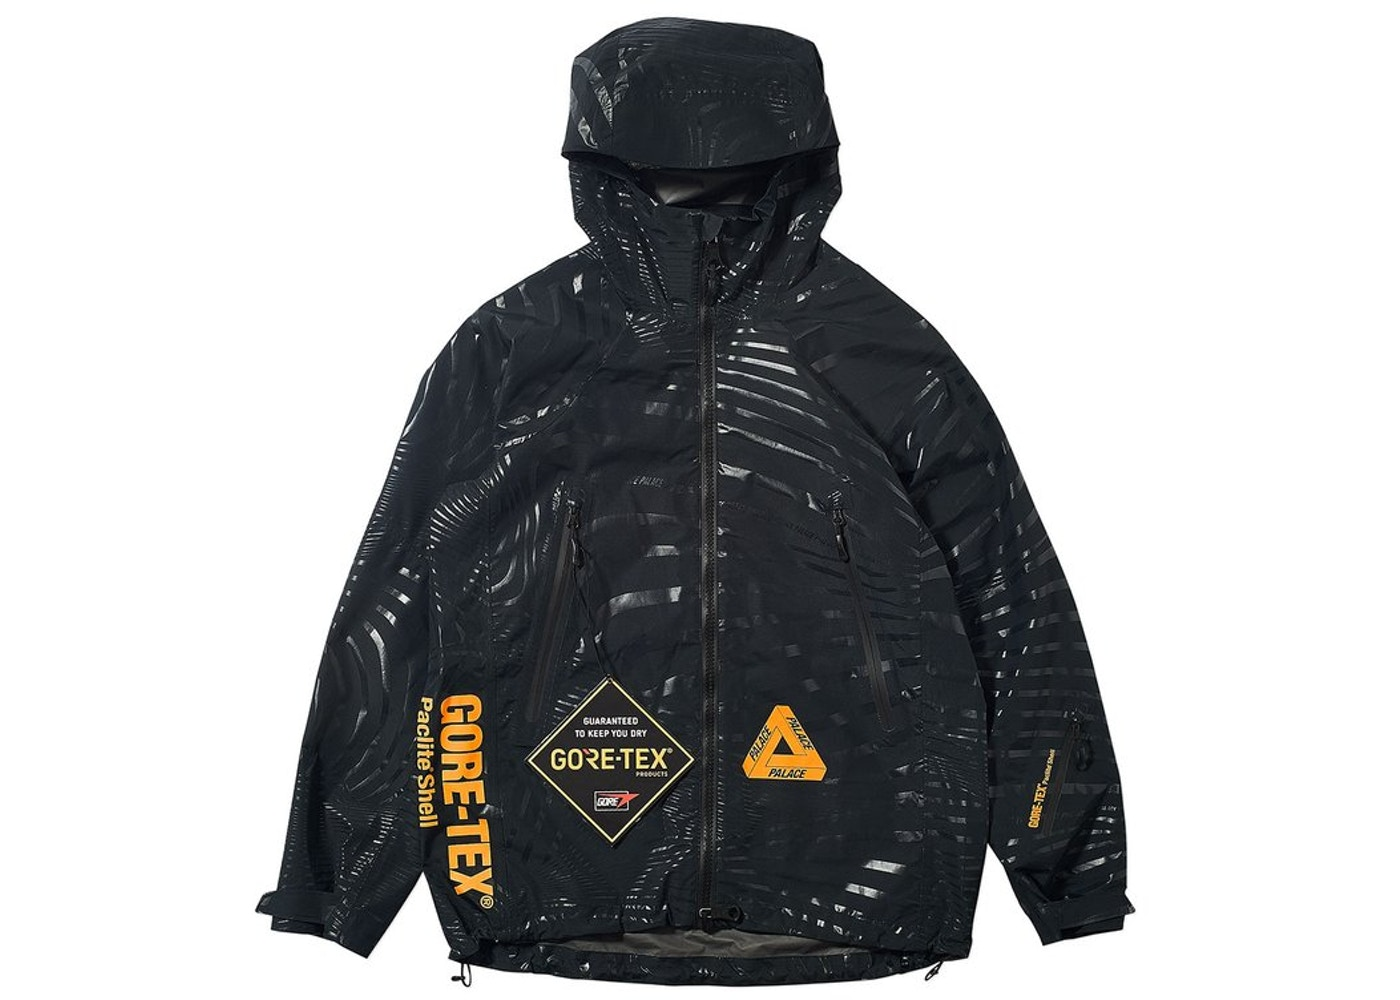 5c0b6a17f311 Palace Gore-Tex Vortex Paclite Jacket Black - FW18